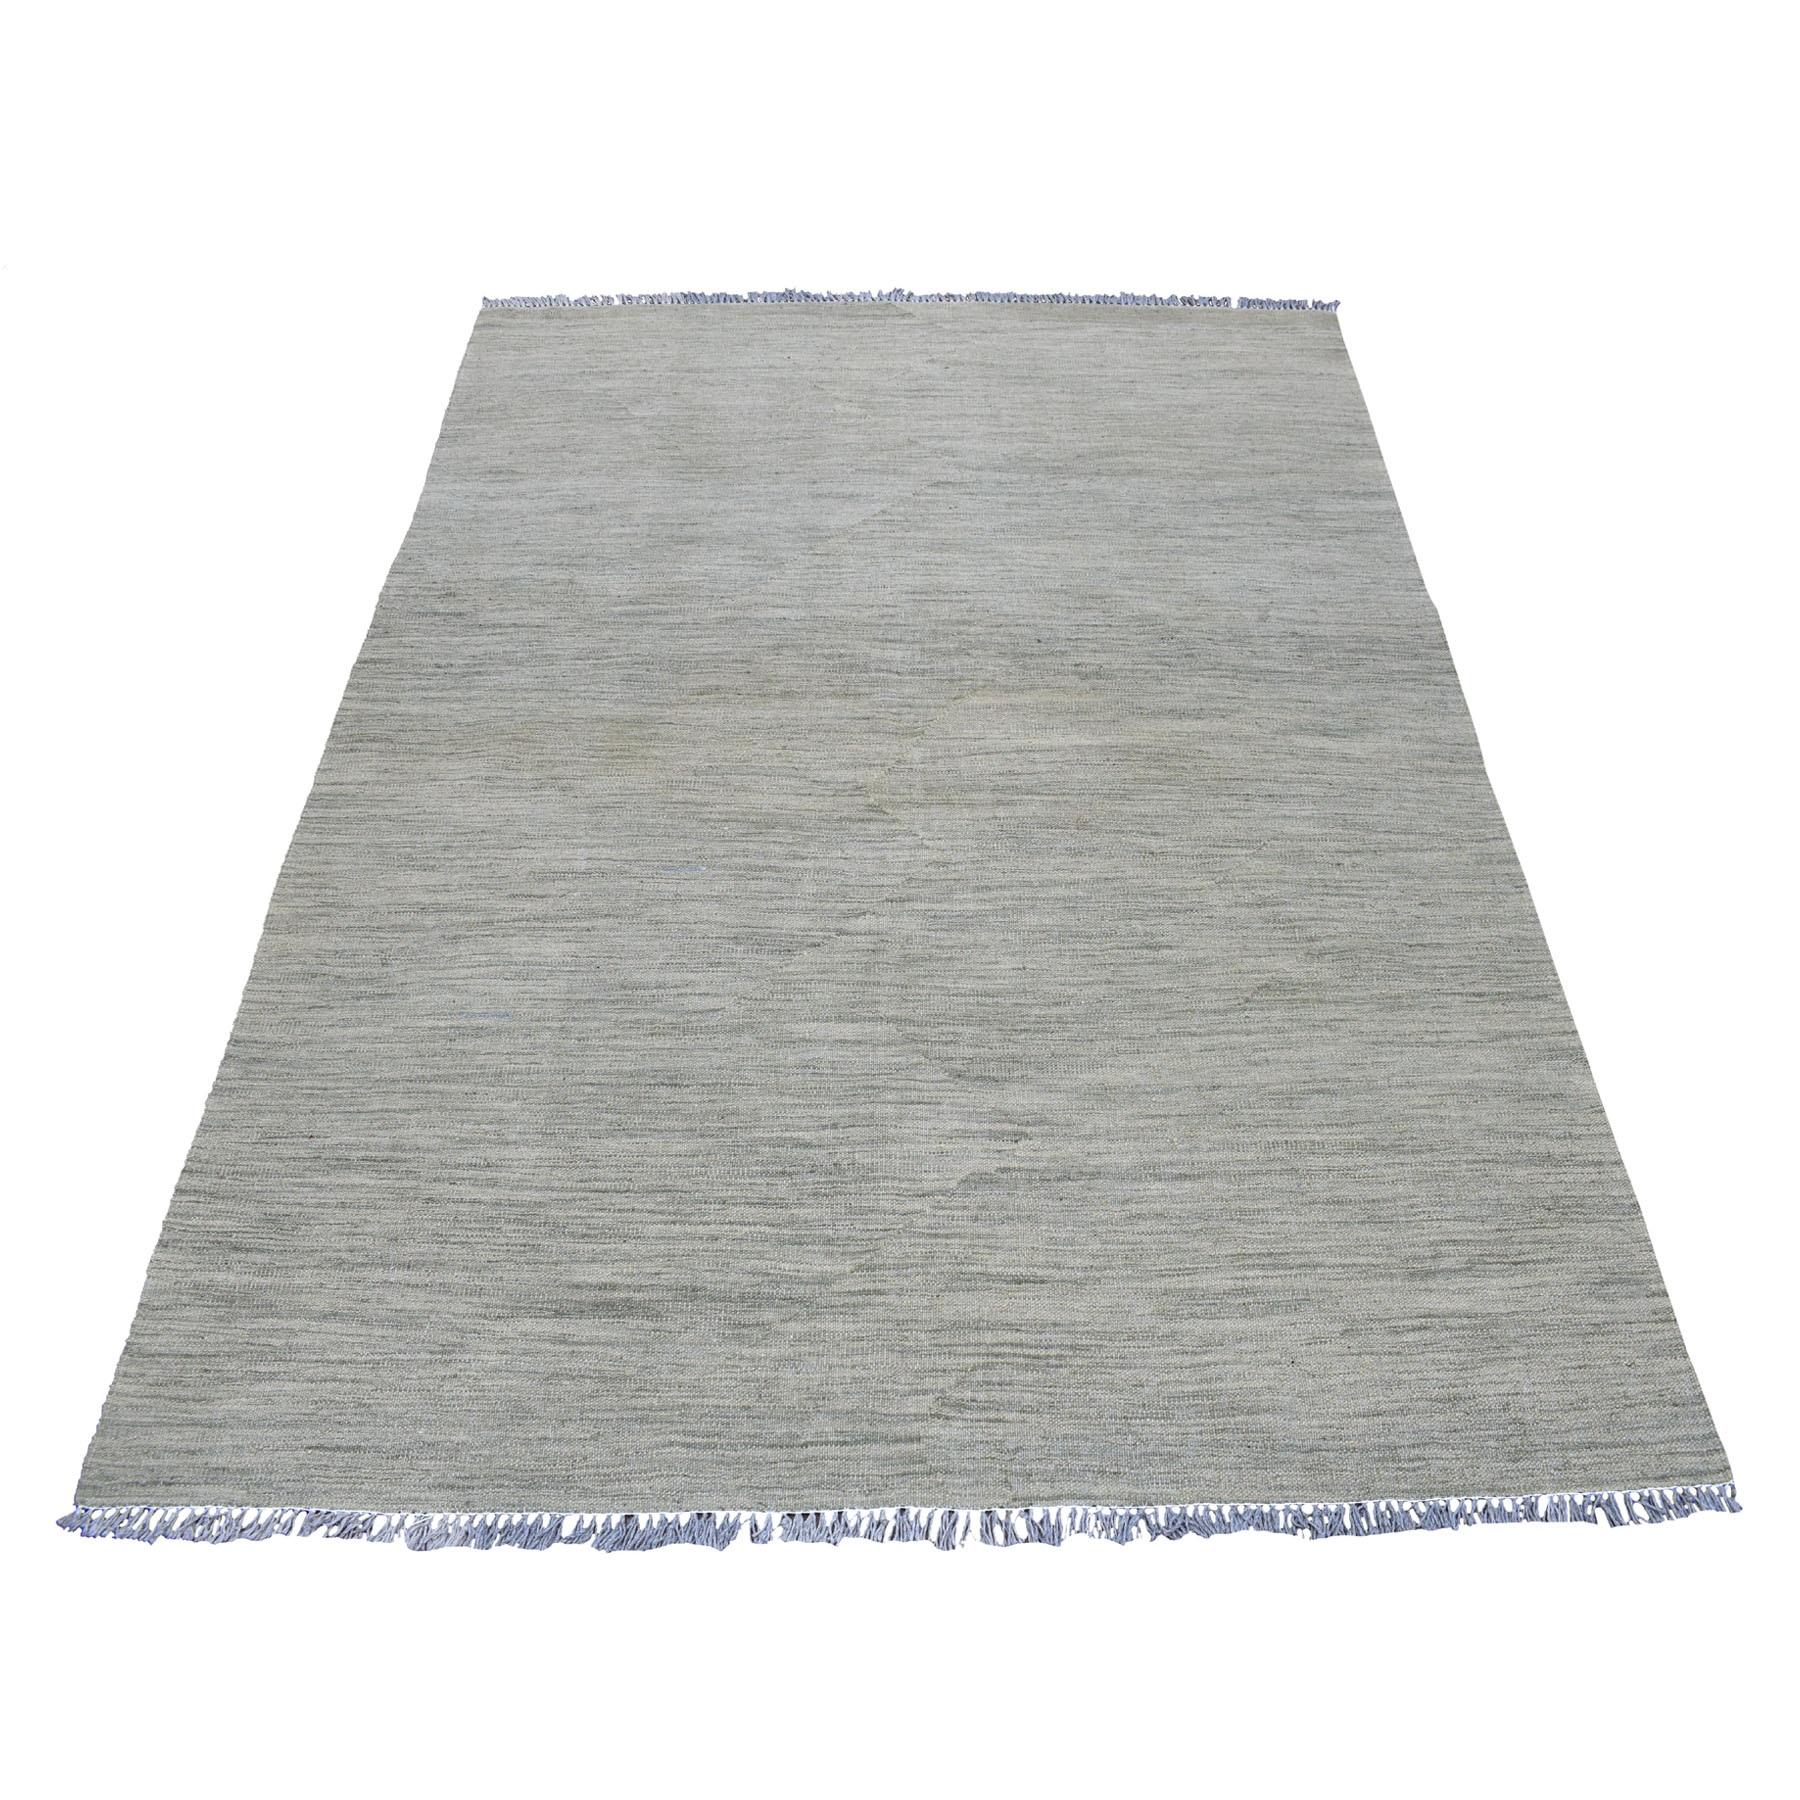 Fine Kilim Collection Hand Woven Grey Rug No: 01108434